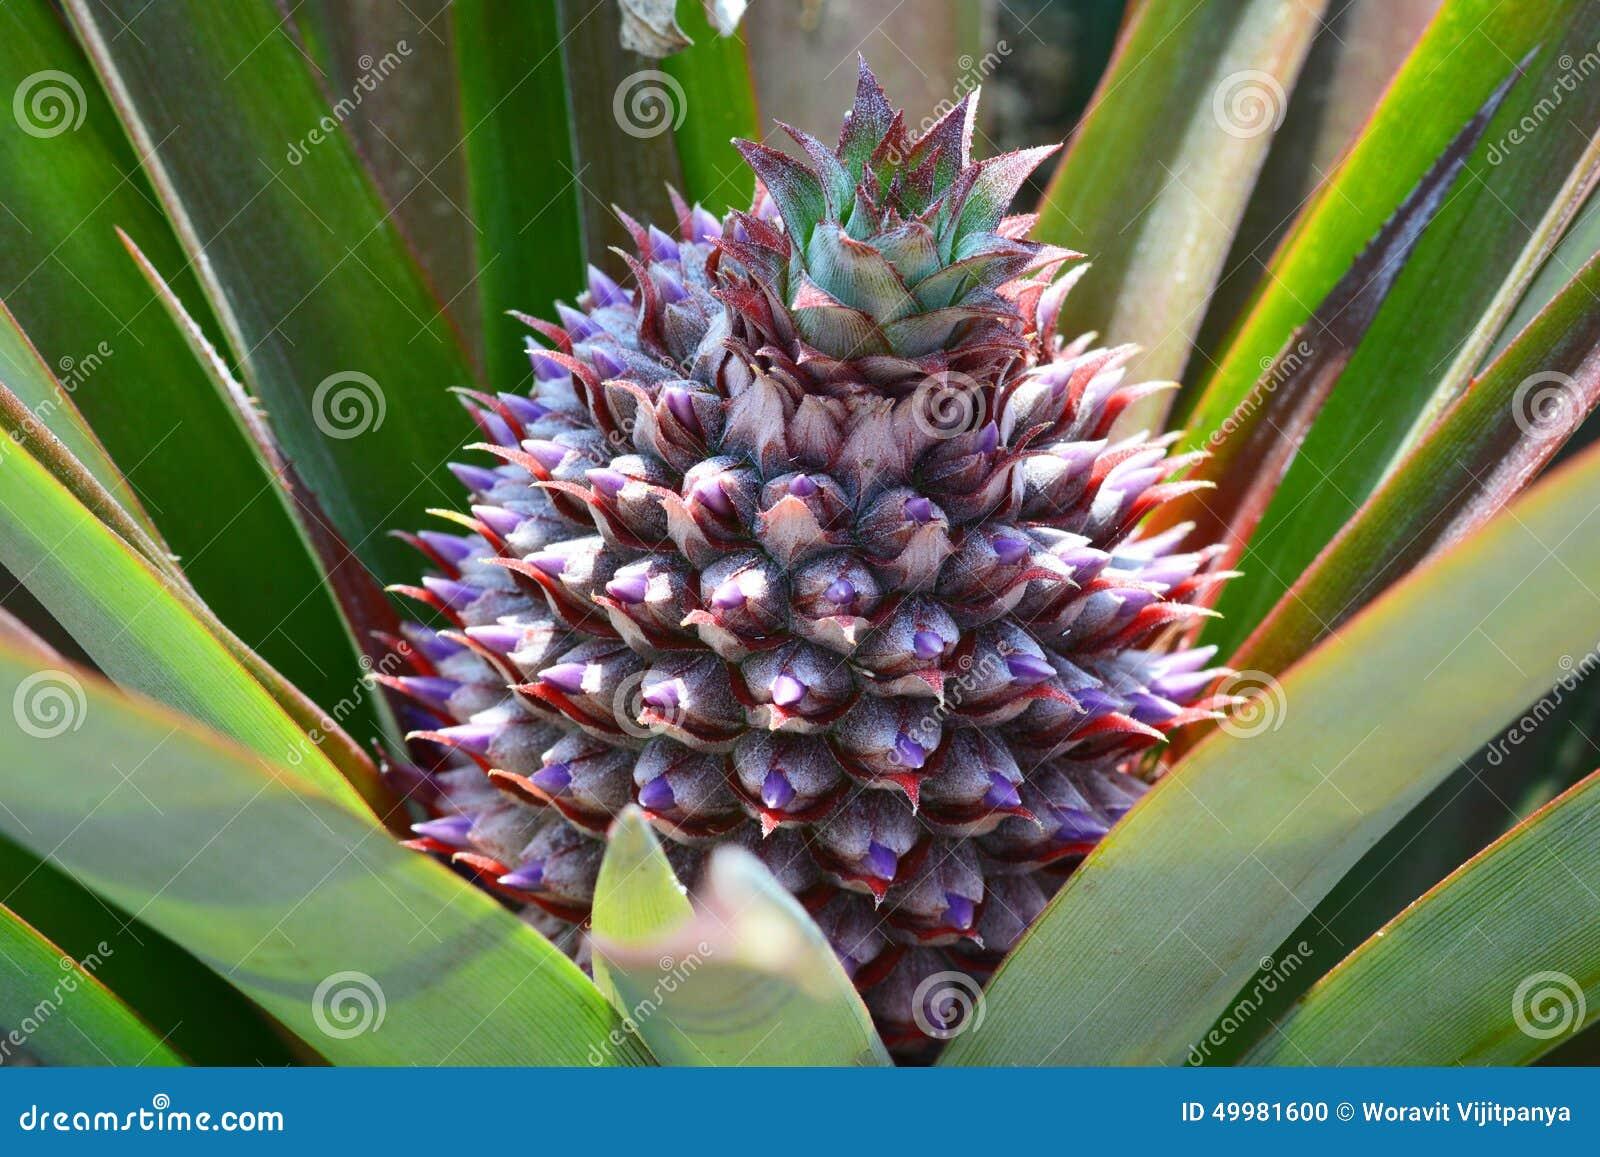 arbre d 39 ananas cru photo stock image 49981600. Black Bedroom Furniture Sets. Home Design Ideas